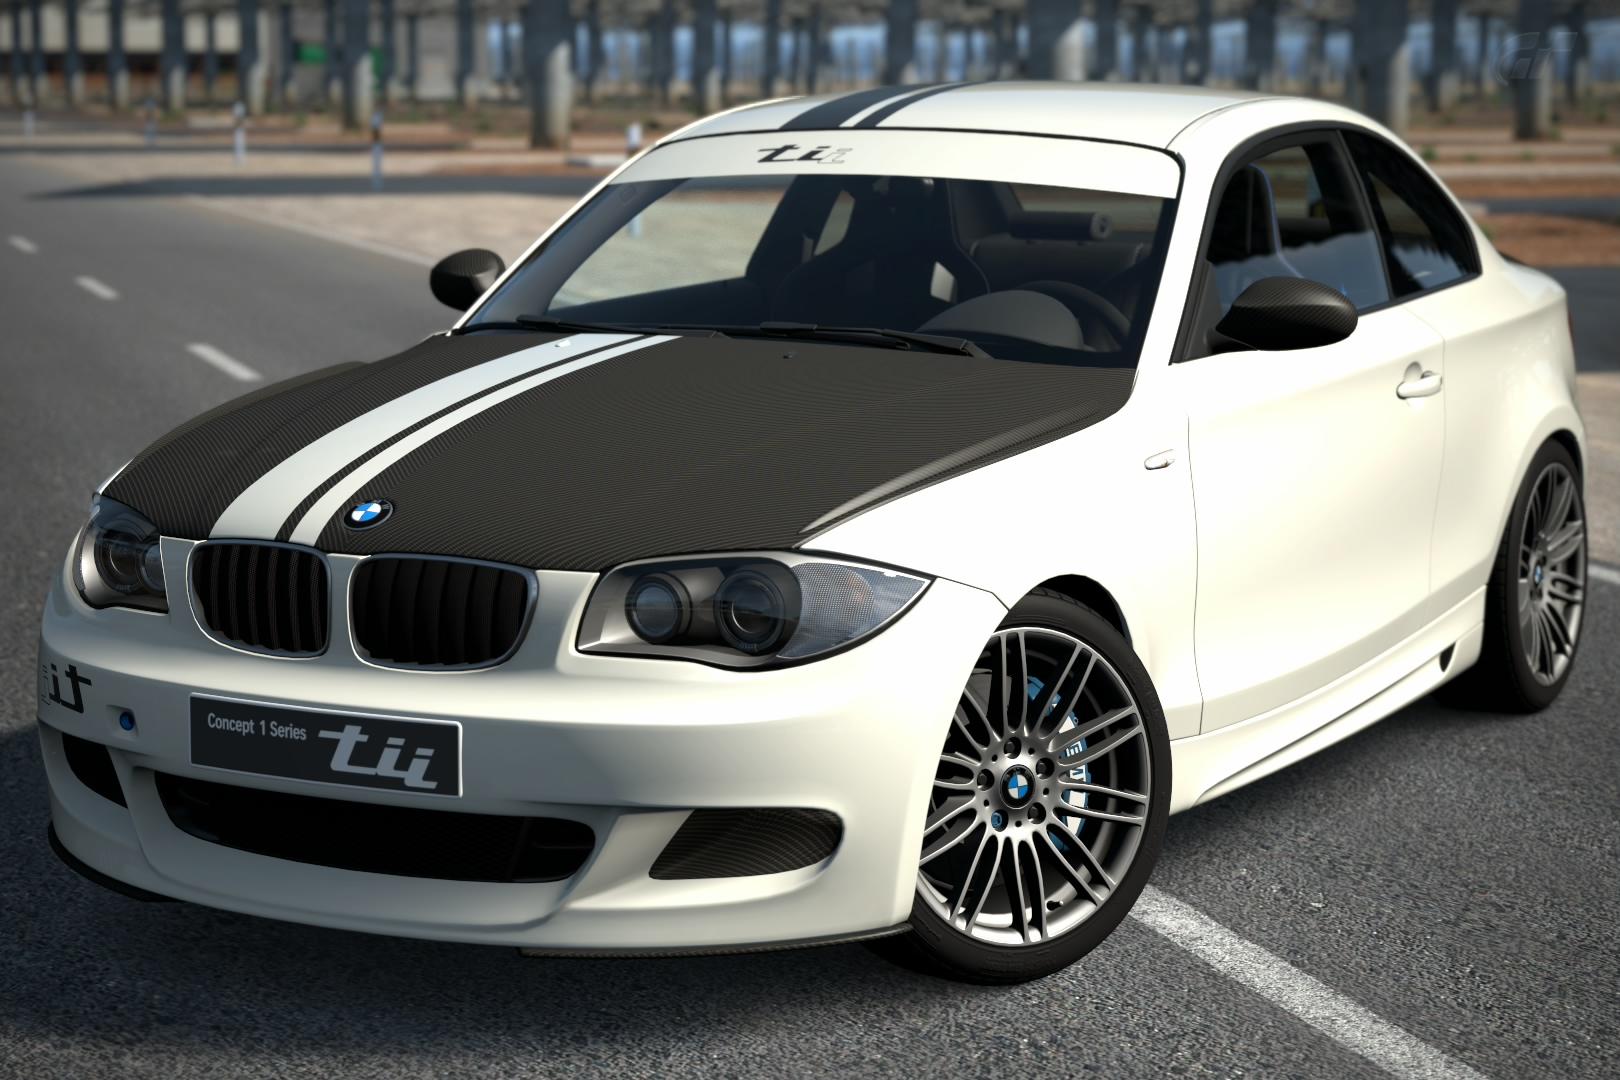 bmw concept 1 series tii 39 07 gran turismo wiki gran turismo tracks cars games and more. Black Bedroom Furniture Sets. Home Design Ideas